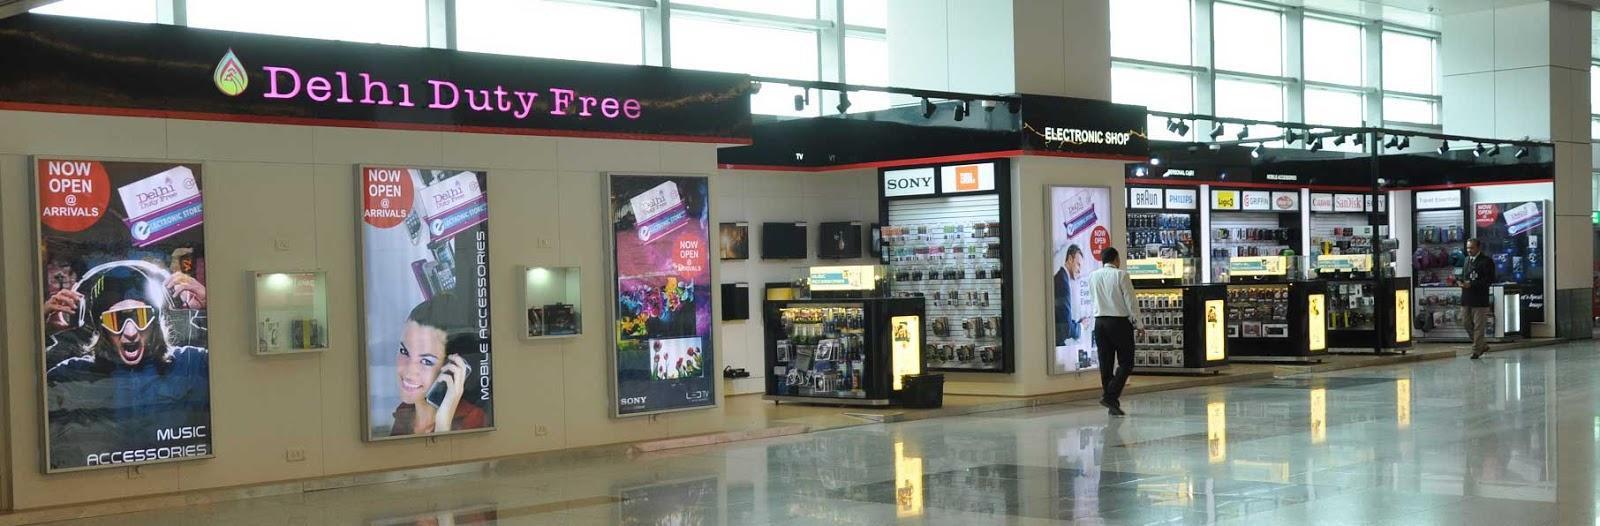 fbe950c28 Located in the amazing Terminal 3 of IGI International Airport